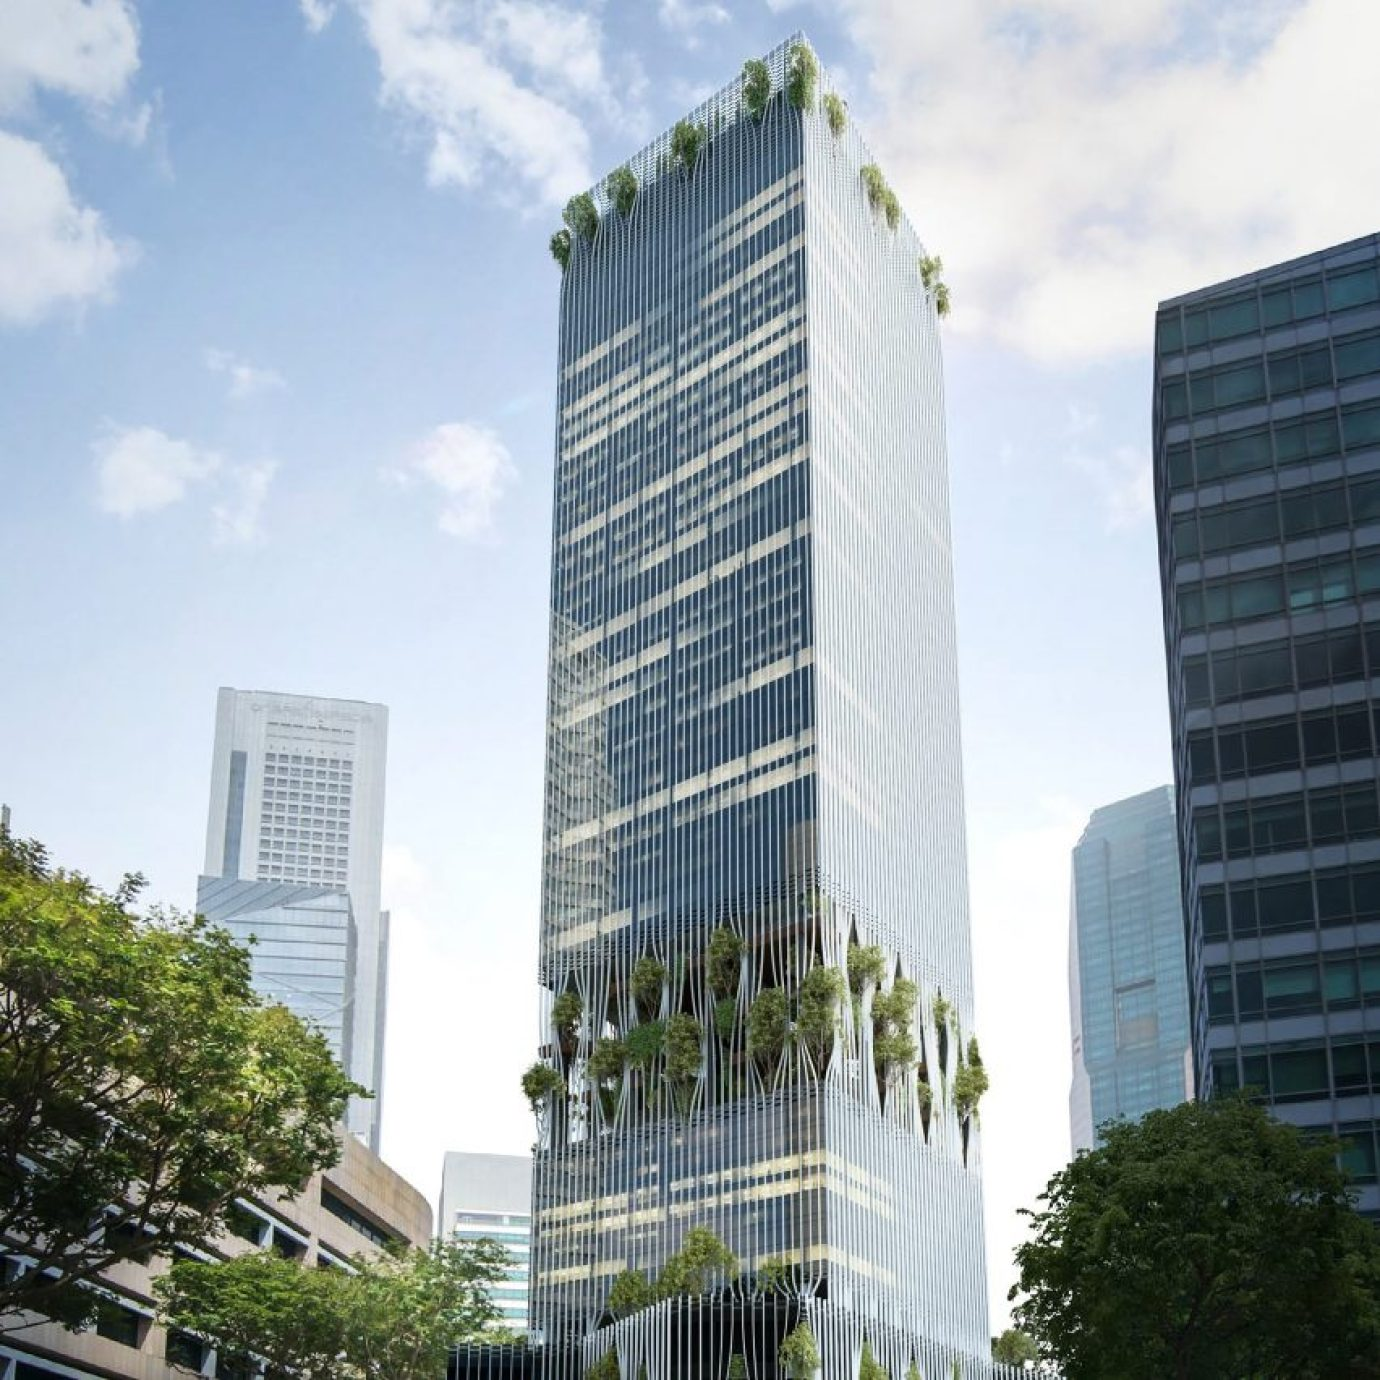 BIG and Carlo Ratti Singapore Tower